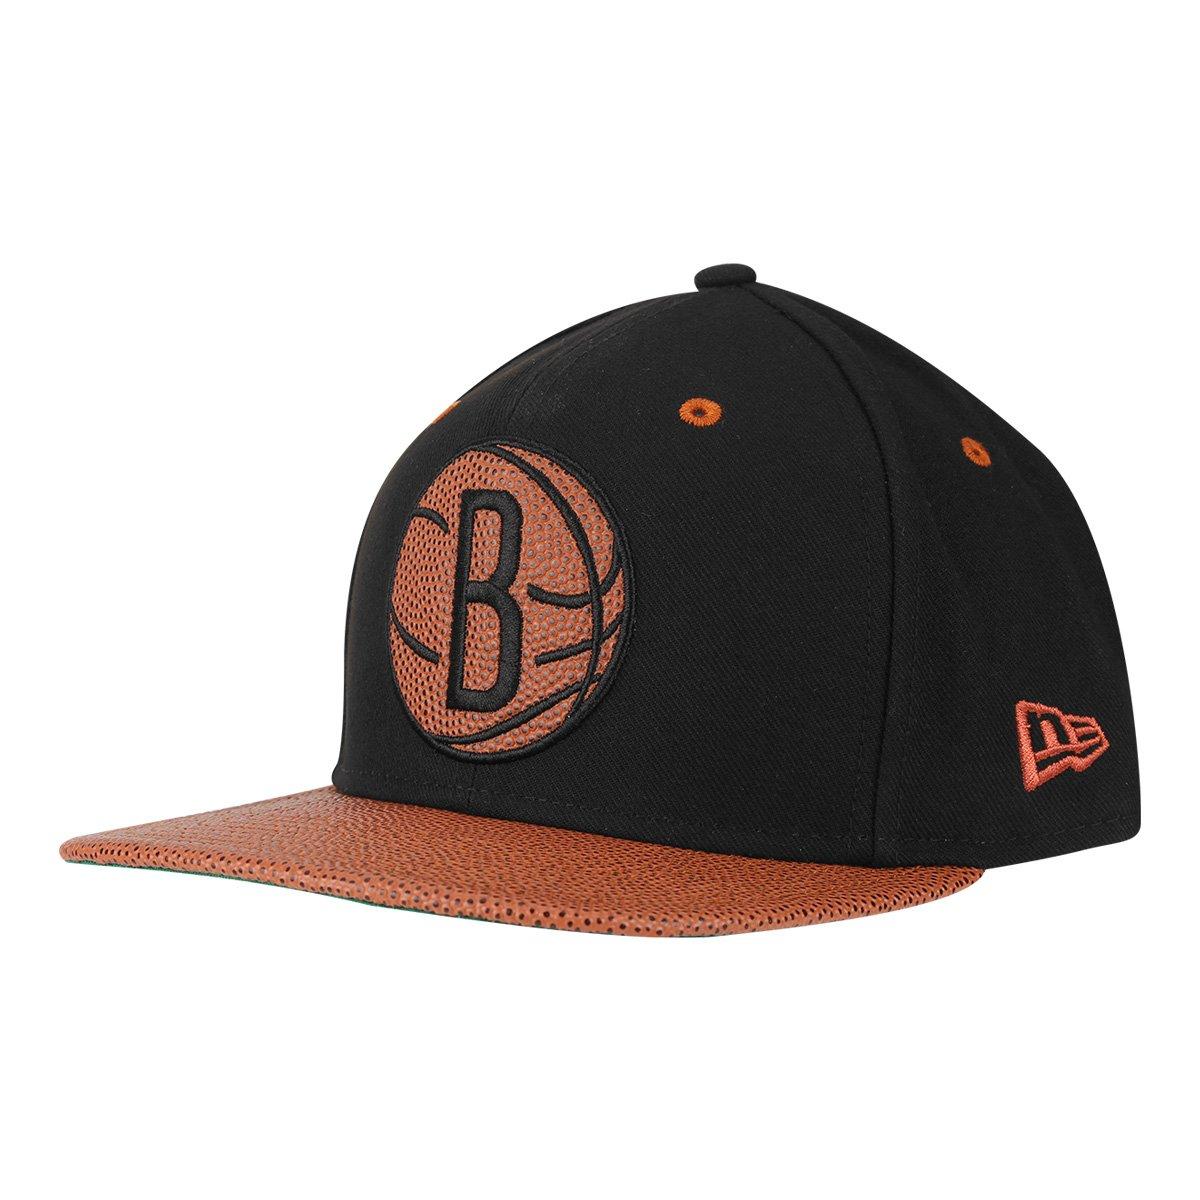 e0895df267114 Boné New Era NBA Brooklyn Nets Aba Reta Basketball